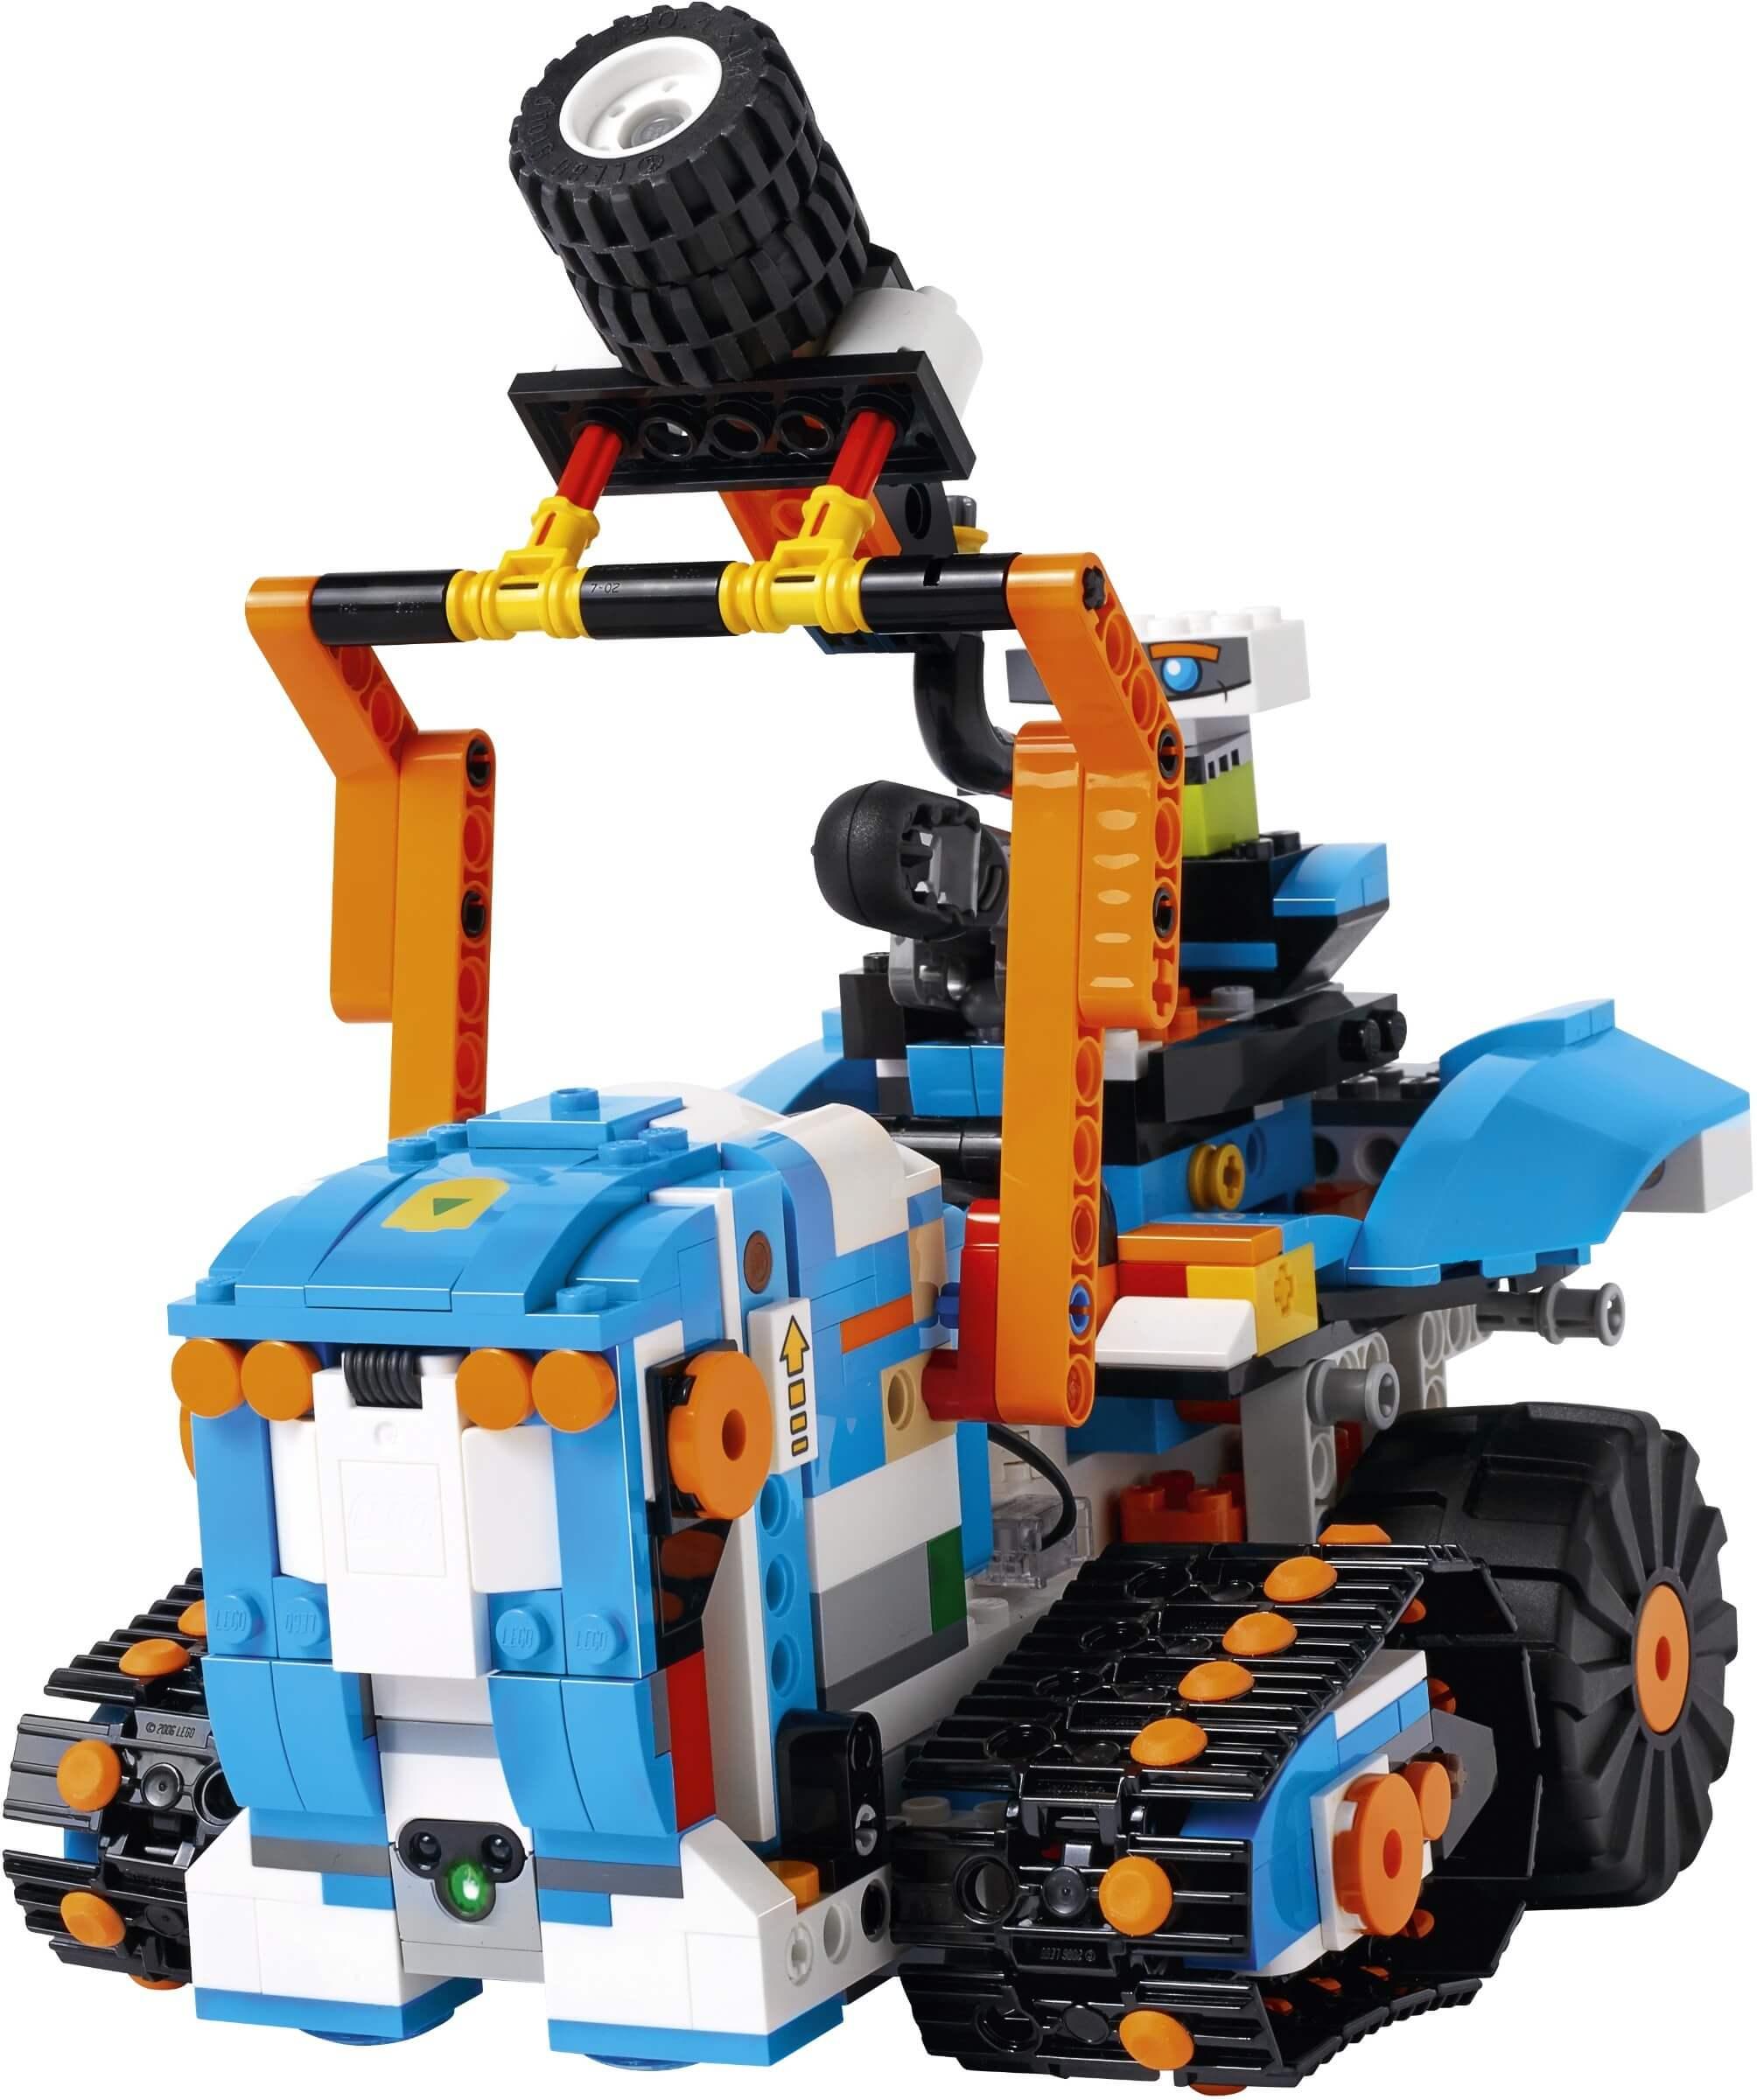 Mua đồ chơi LEGO 17101 - LEGO Ideas 17101 - Xếp hình Robot Điều Khiển 5-trong-1 (LEGO Ideas 17101 BOOST Creative Toolbox)